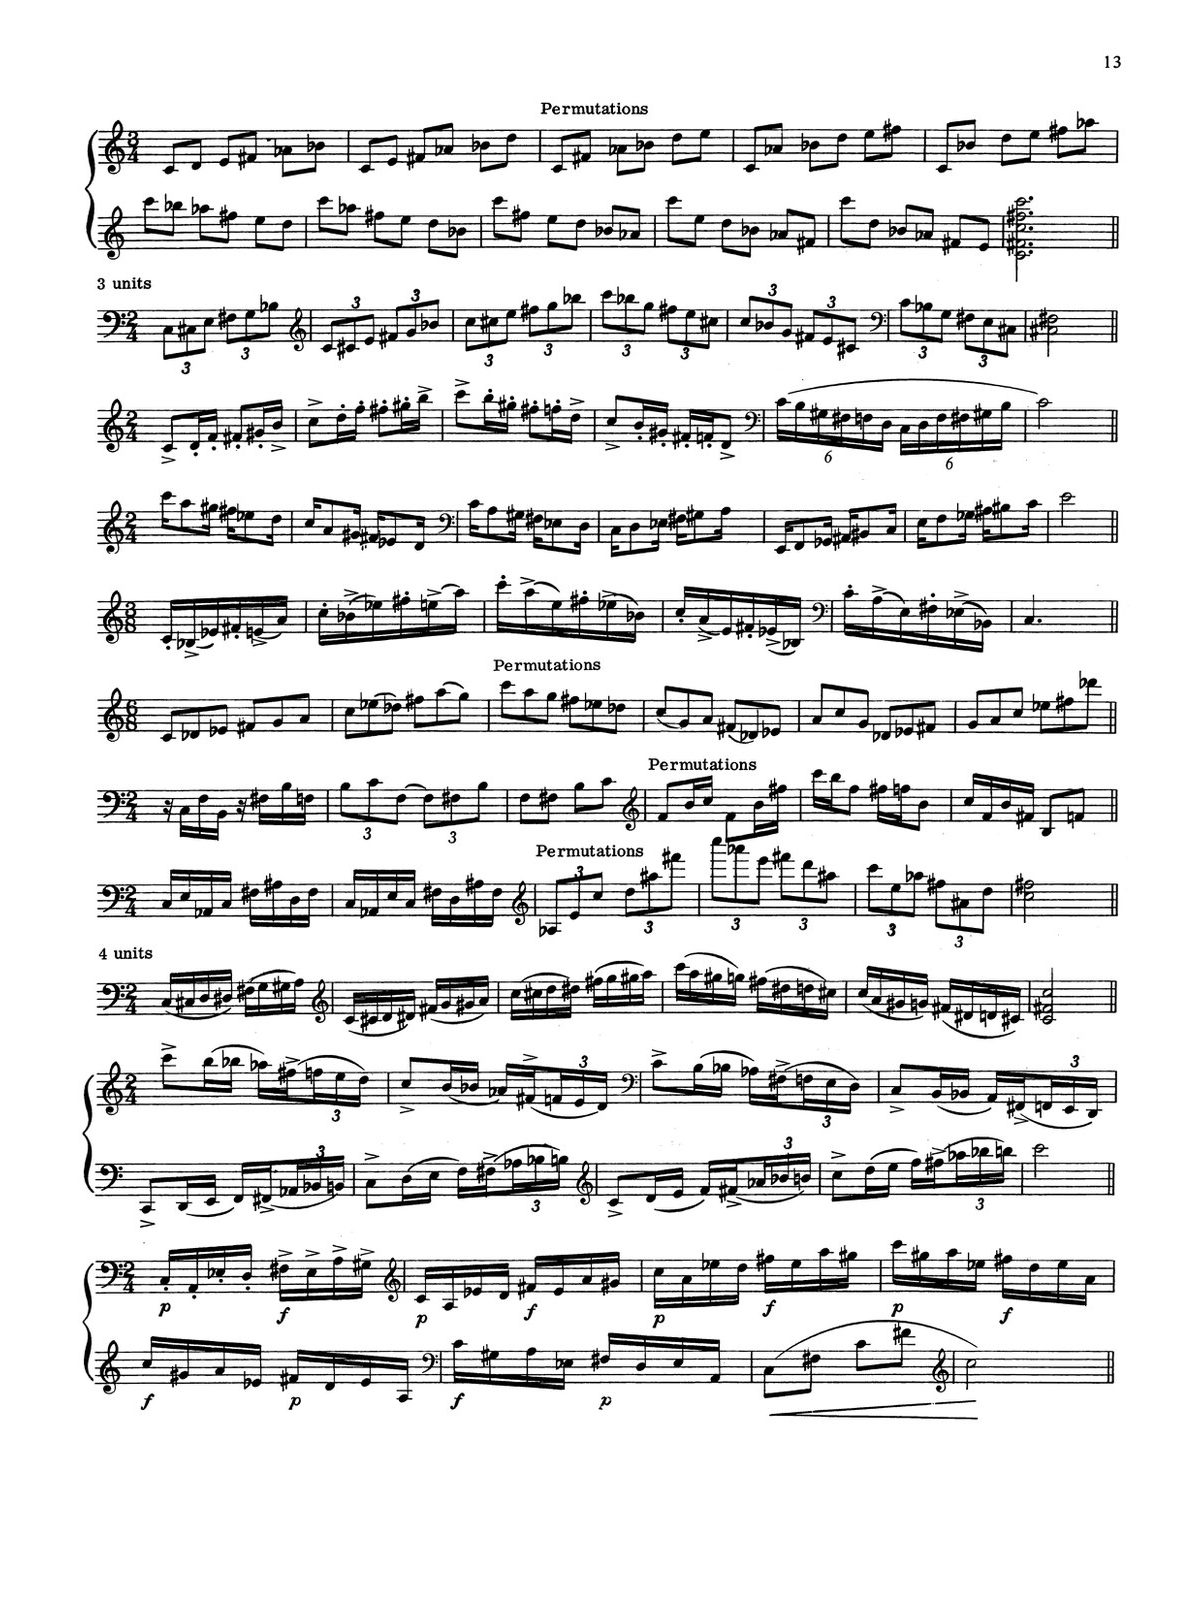 Deutsch, Lexicon of Symmetric Scales and Tonal Patterns-p15